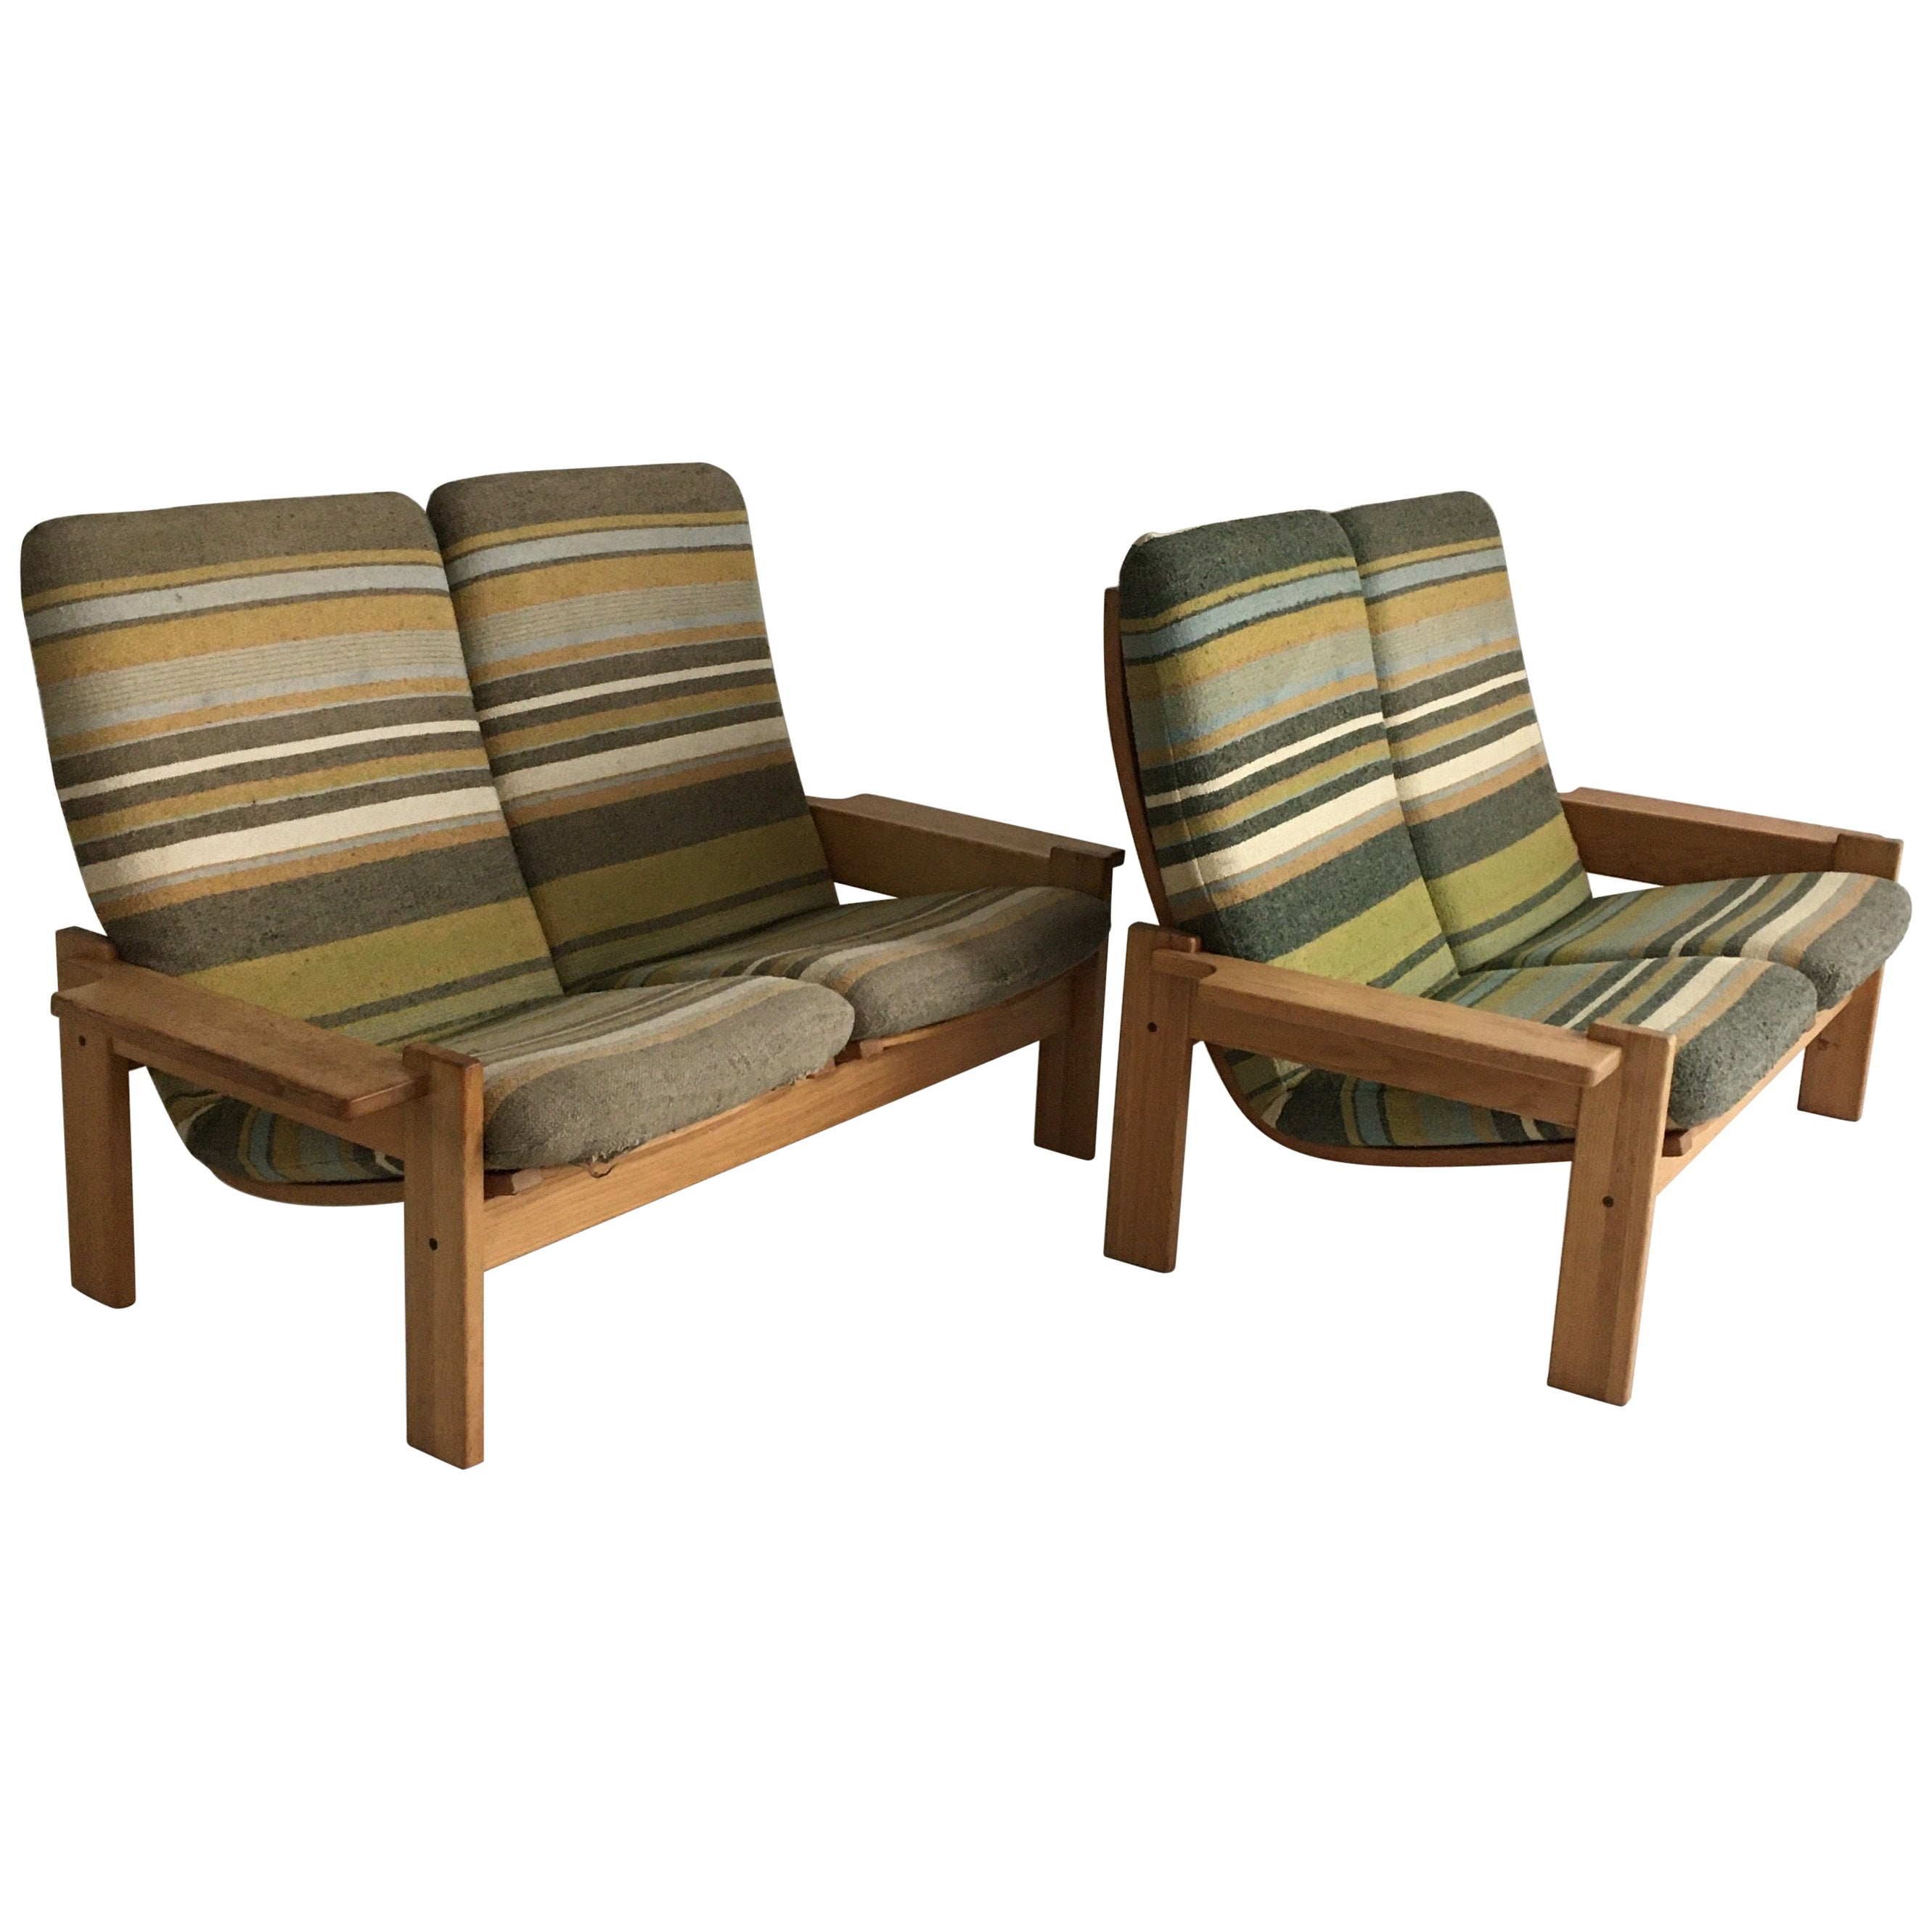 Yngve Ekstrom for Swedese Møbler Two-Seat Sofas Loveseats a Pair